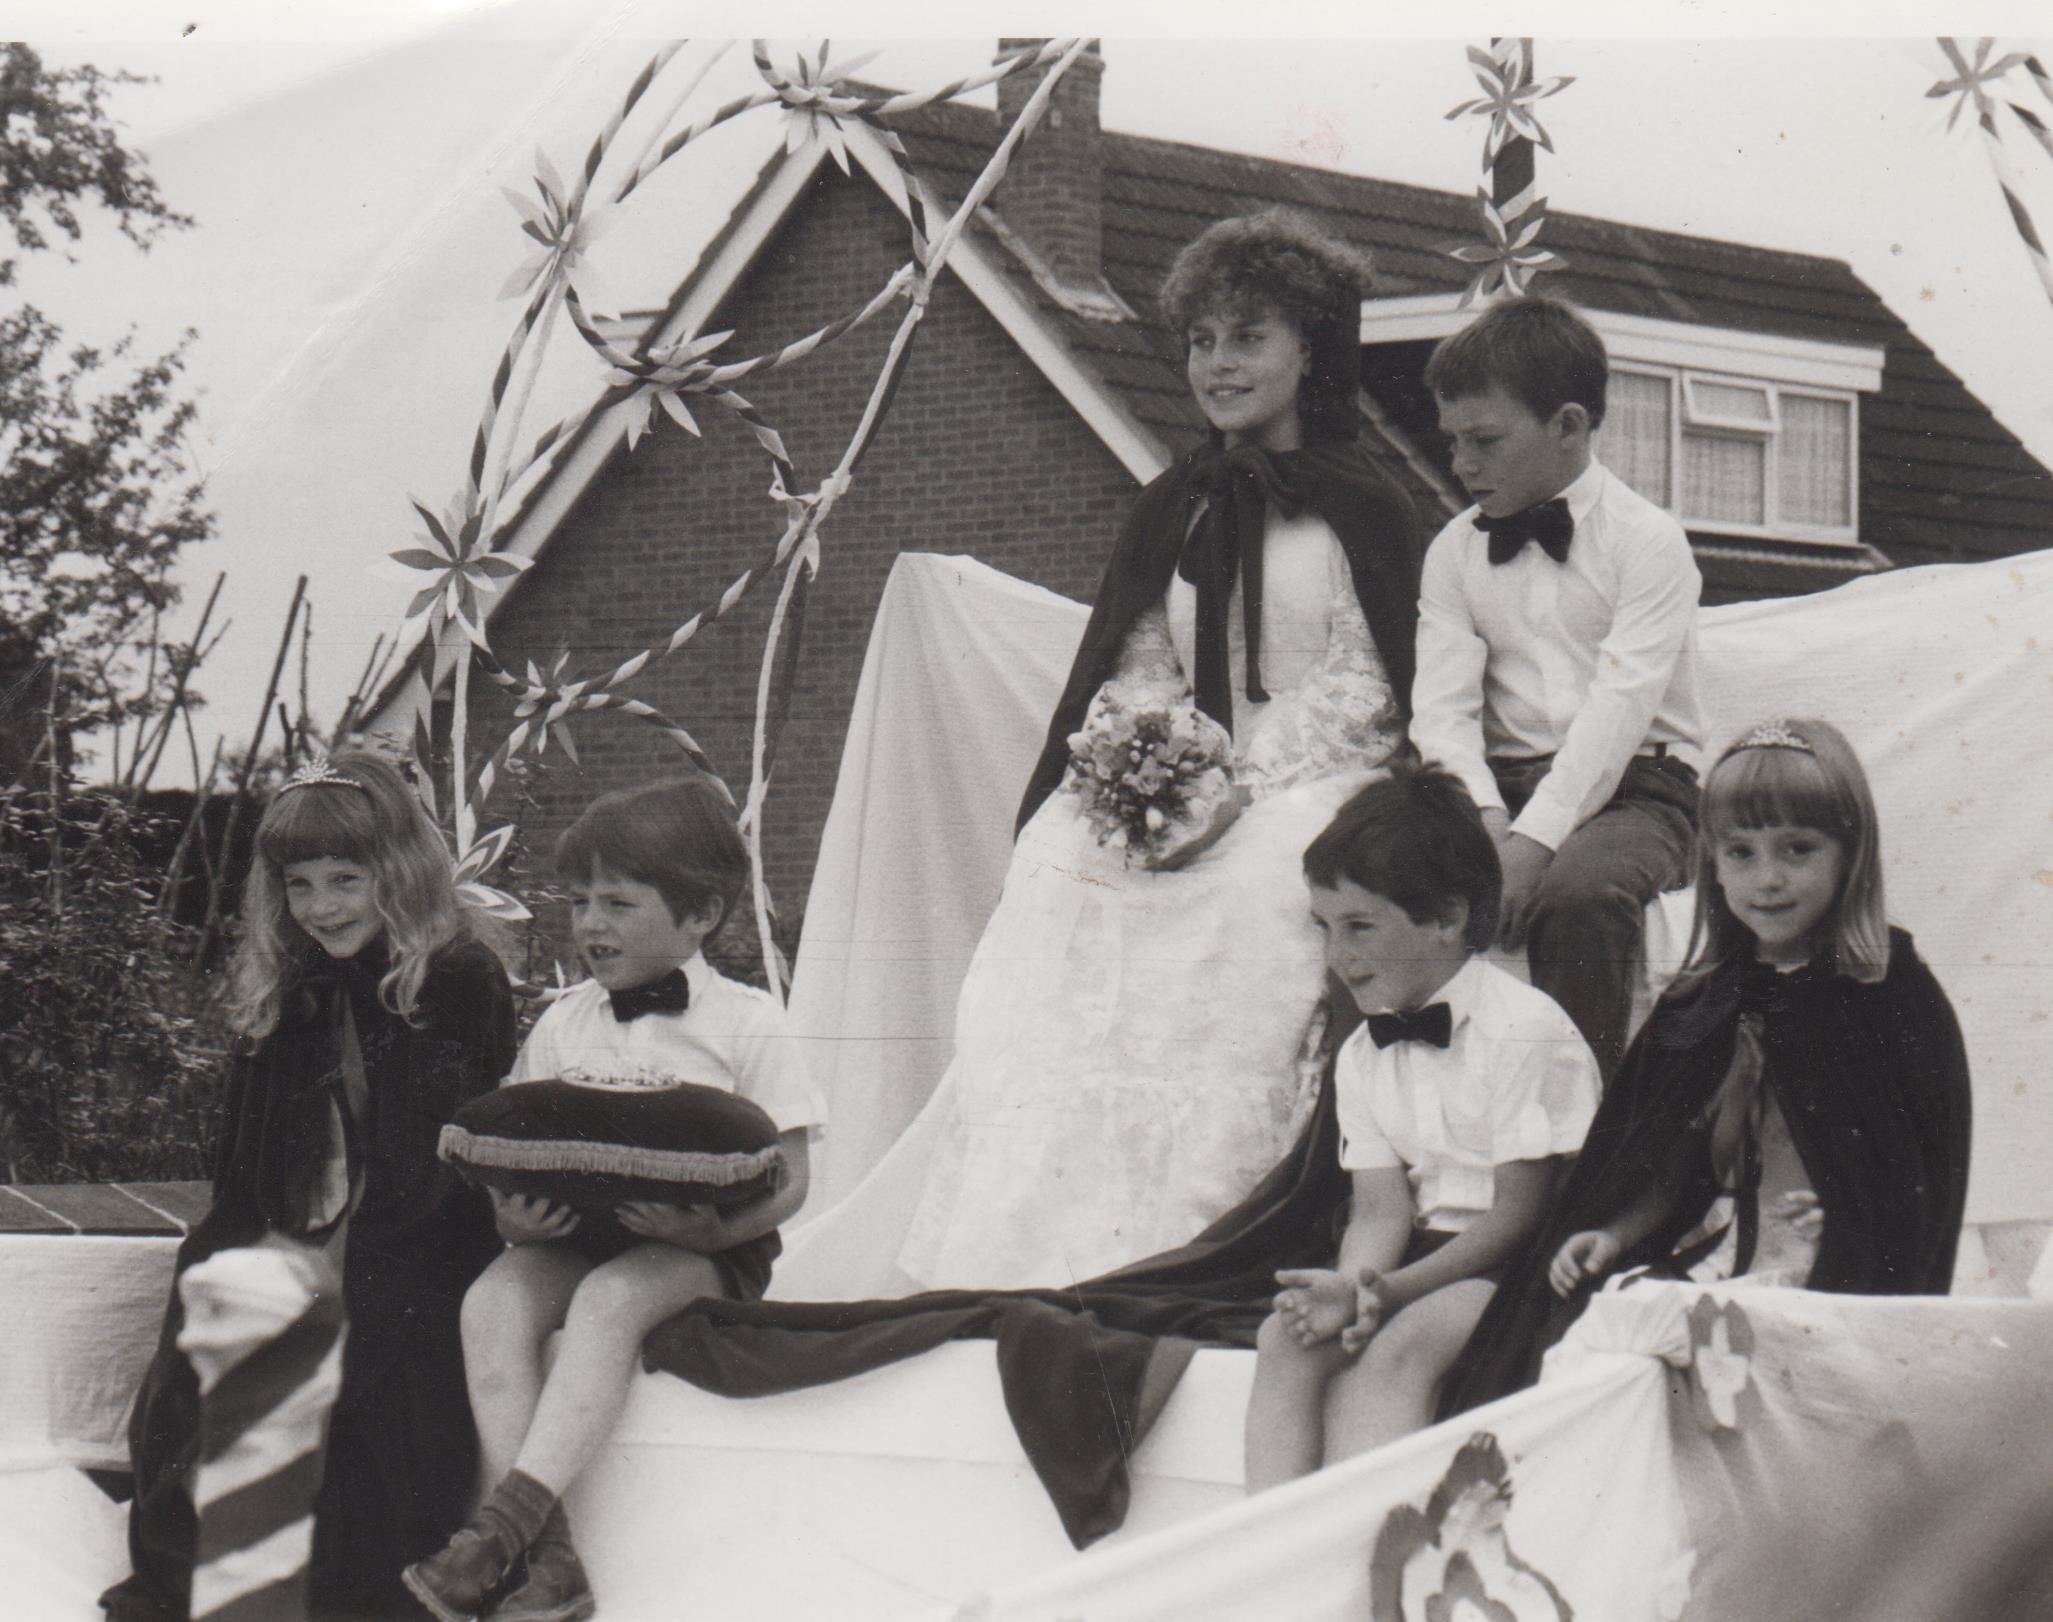 events_carnival_1985_b19jpg_001.jpg